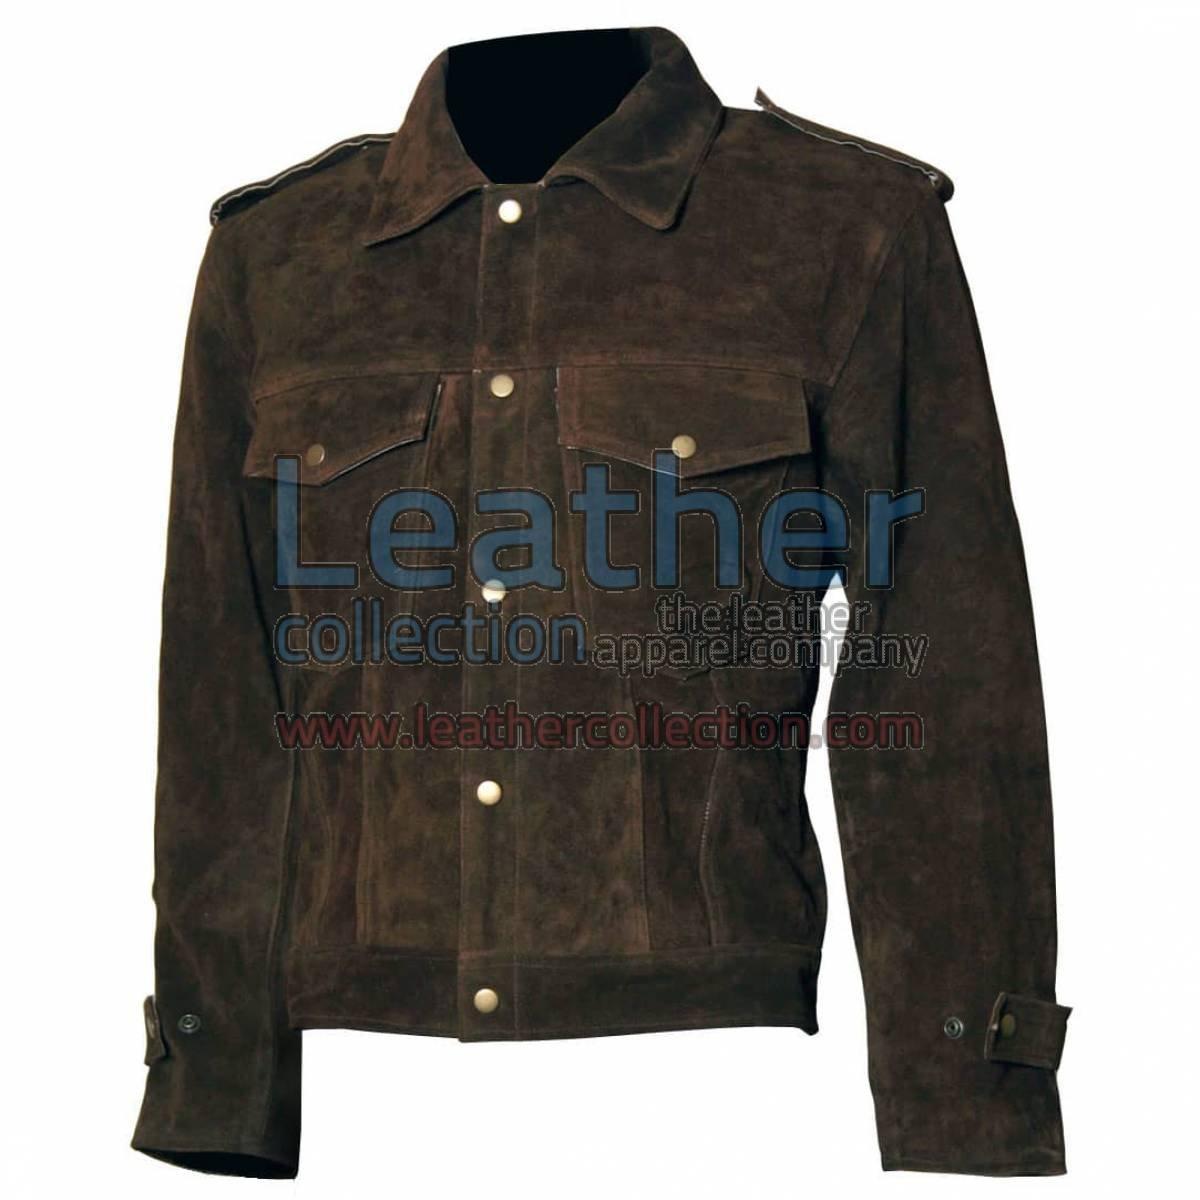 Beatles John Lennon Rubber Soul Brown Suede Leather Jacket